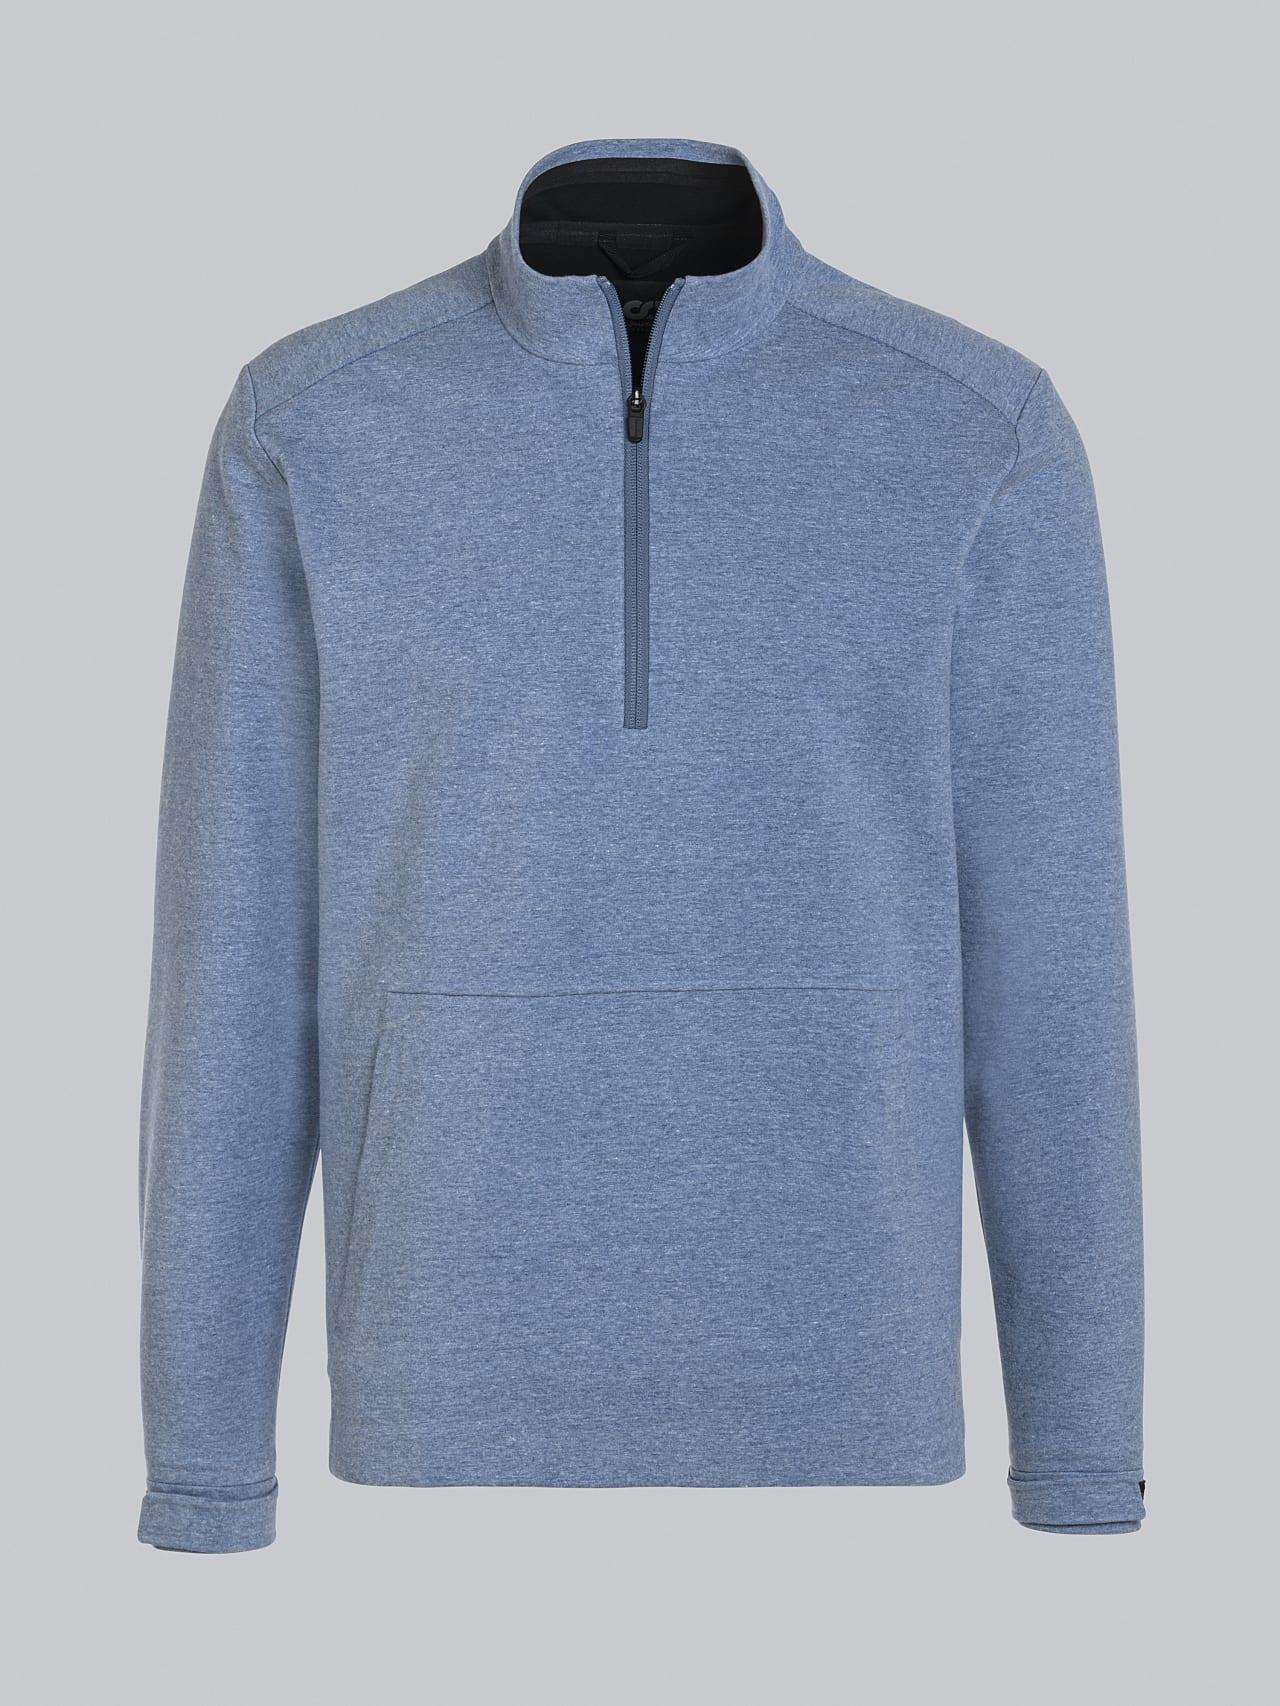 SROTO V1.Y5.02 Waterproof Half-Zip Sweatshirt medium blue Back Alpha Tauri